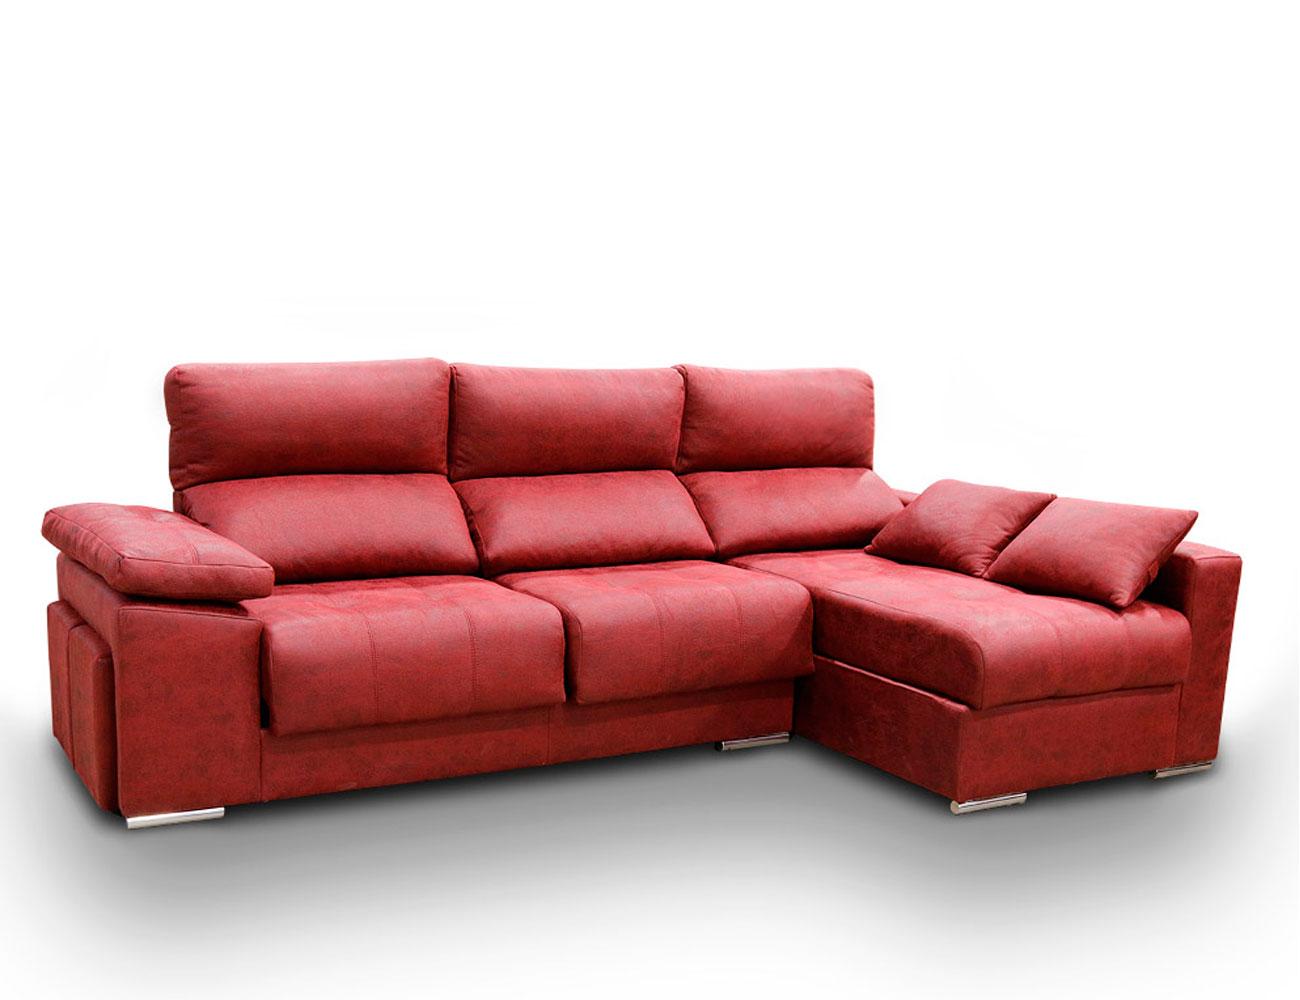 Sofa chaiselongue anti manchas rojo granate22